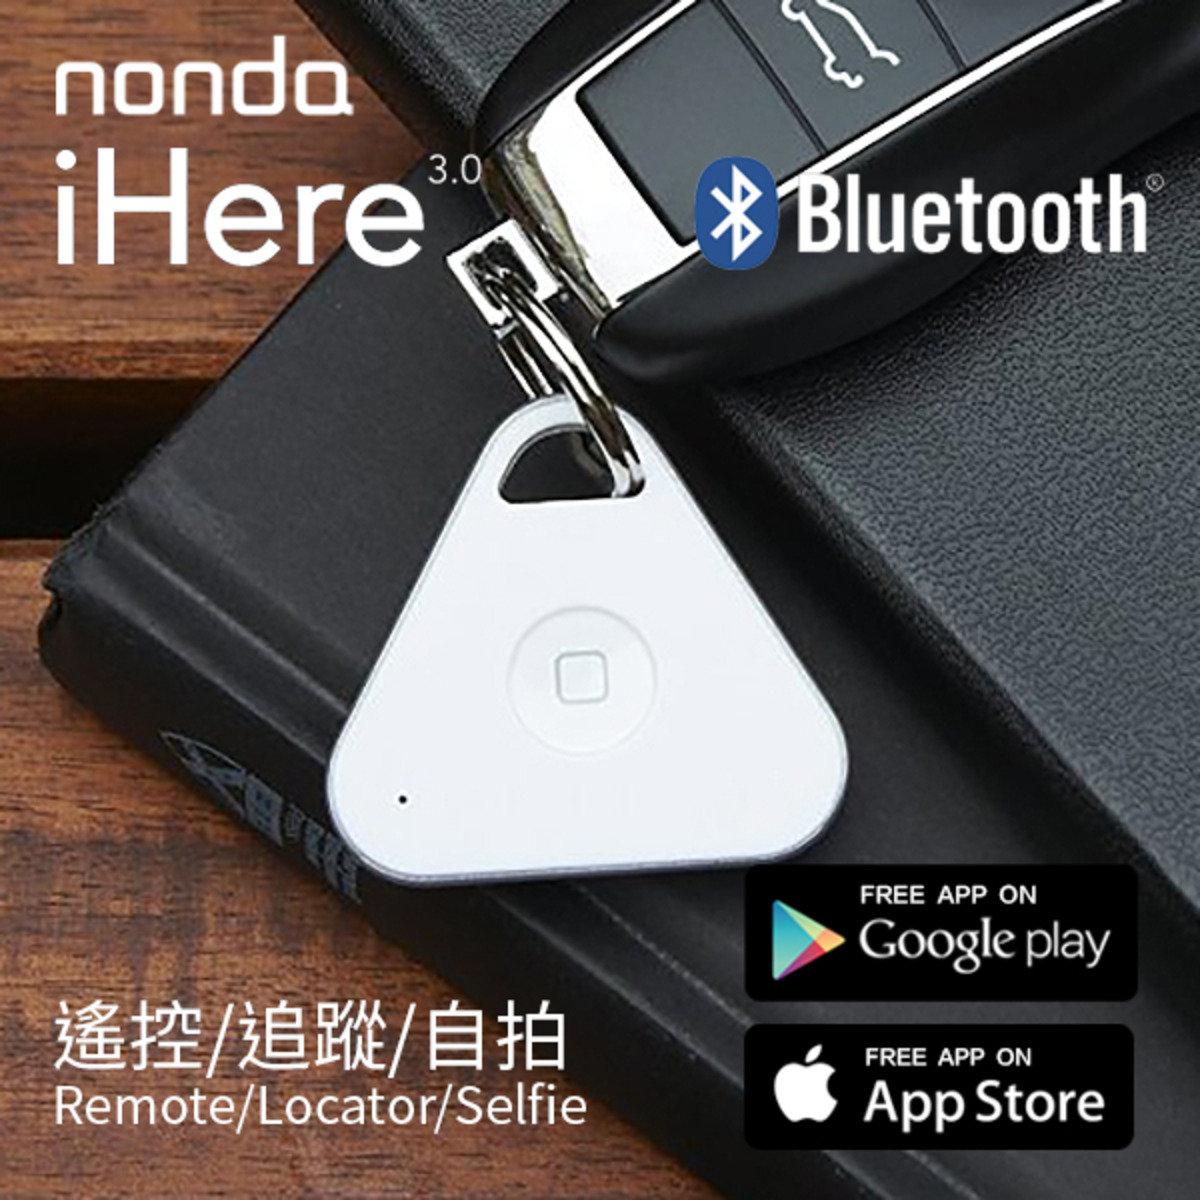 iHere3.0 連接智能手機 迷你電子掛飾 多用途-追蹤/自拍/遙控